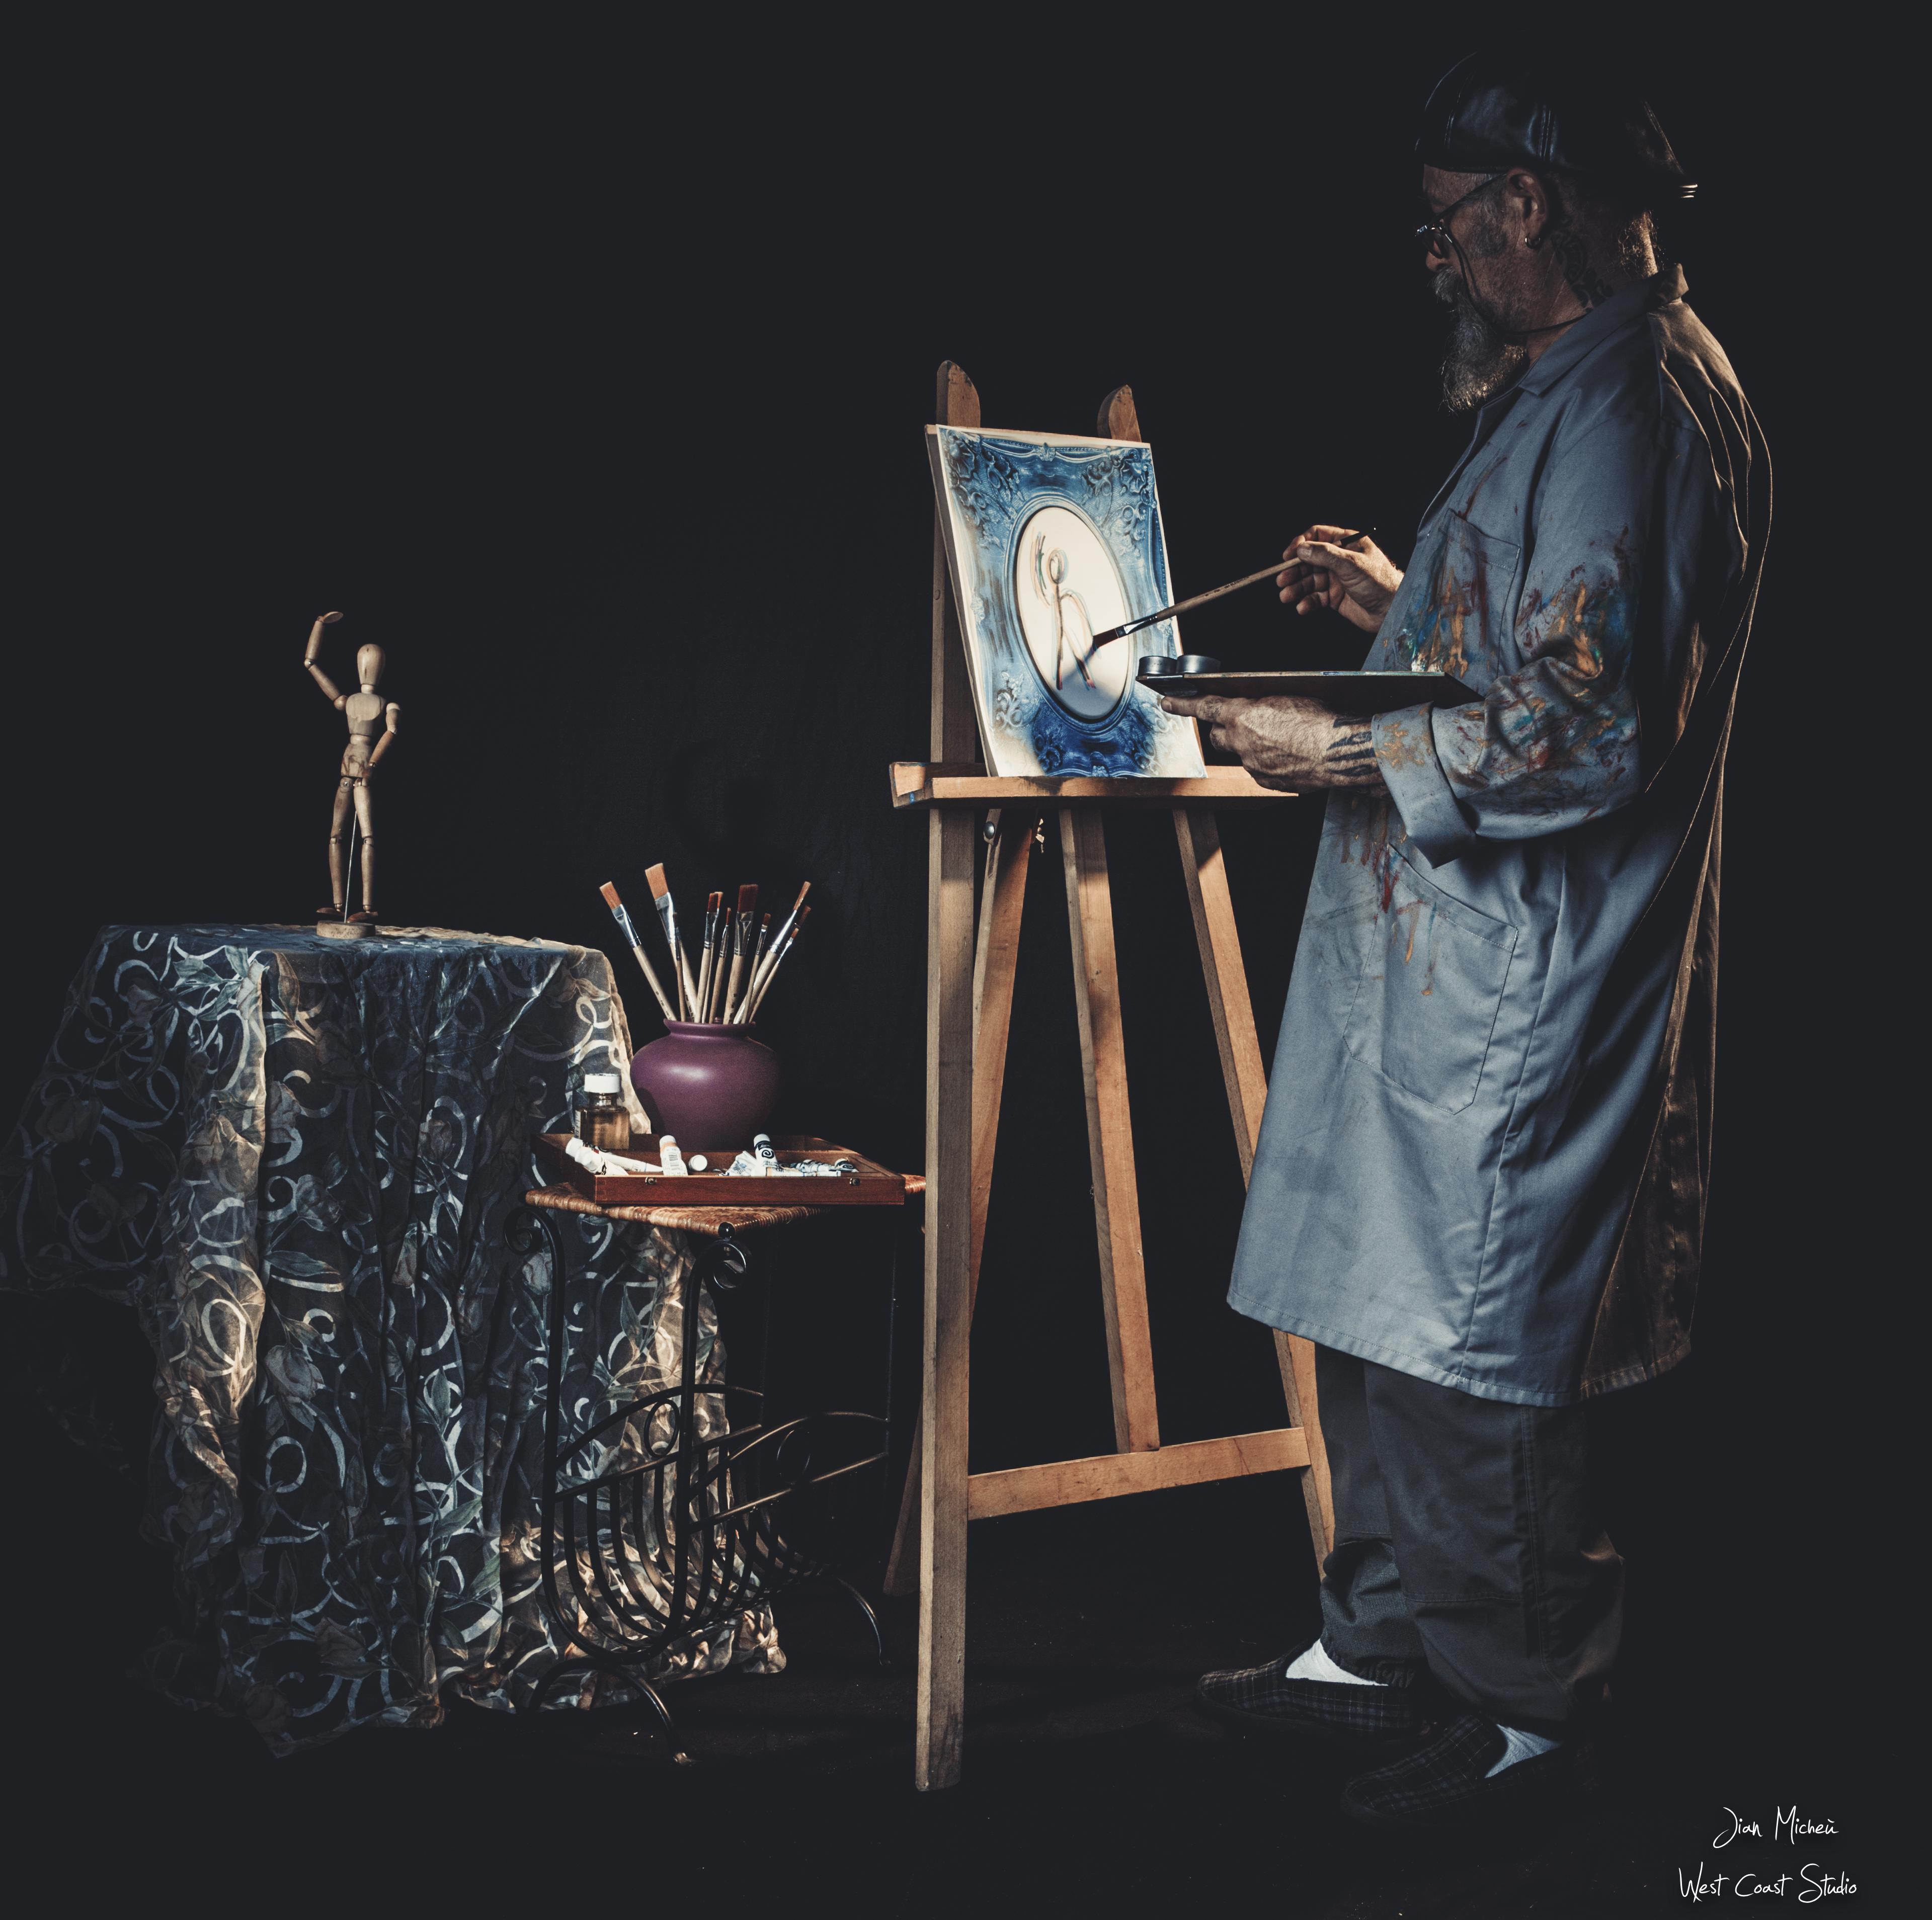 L 'artiste peintre